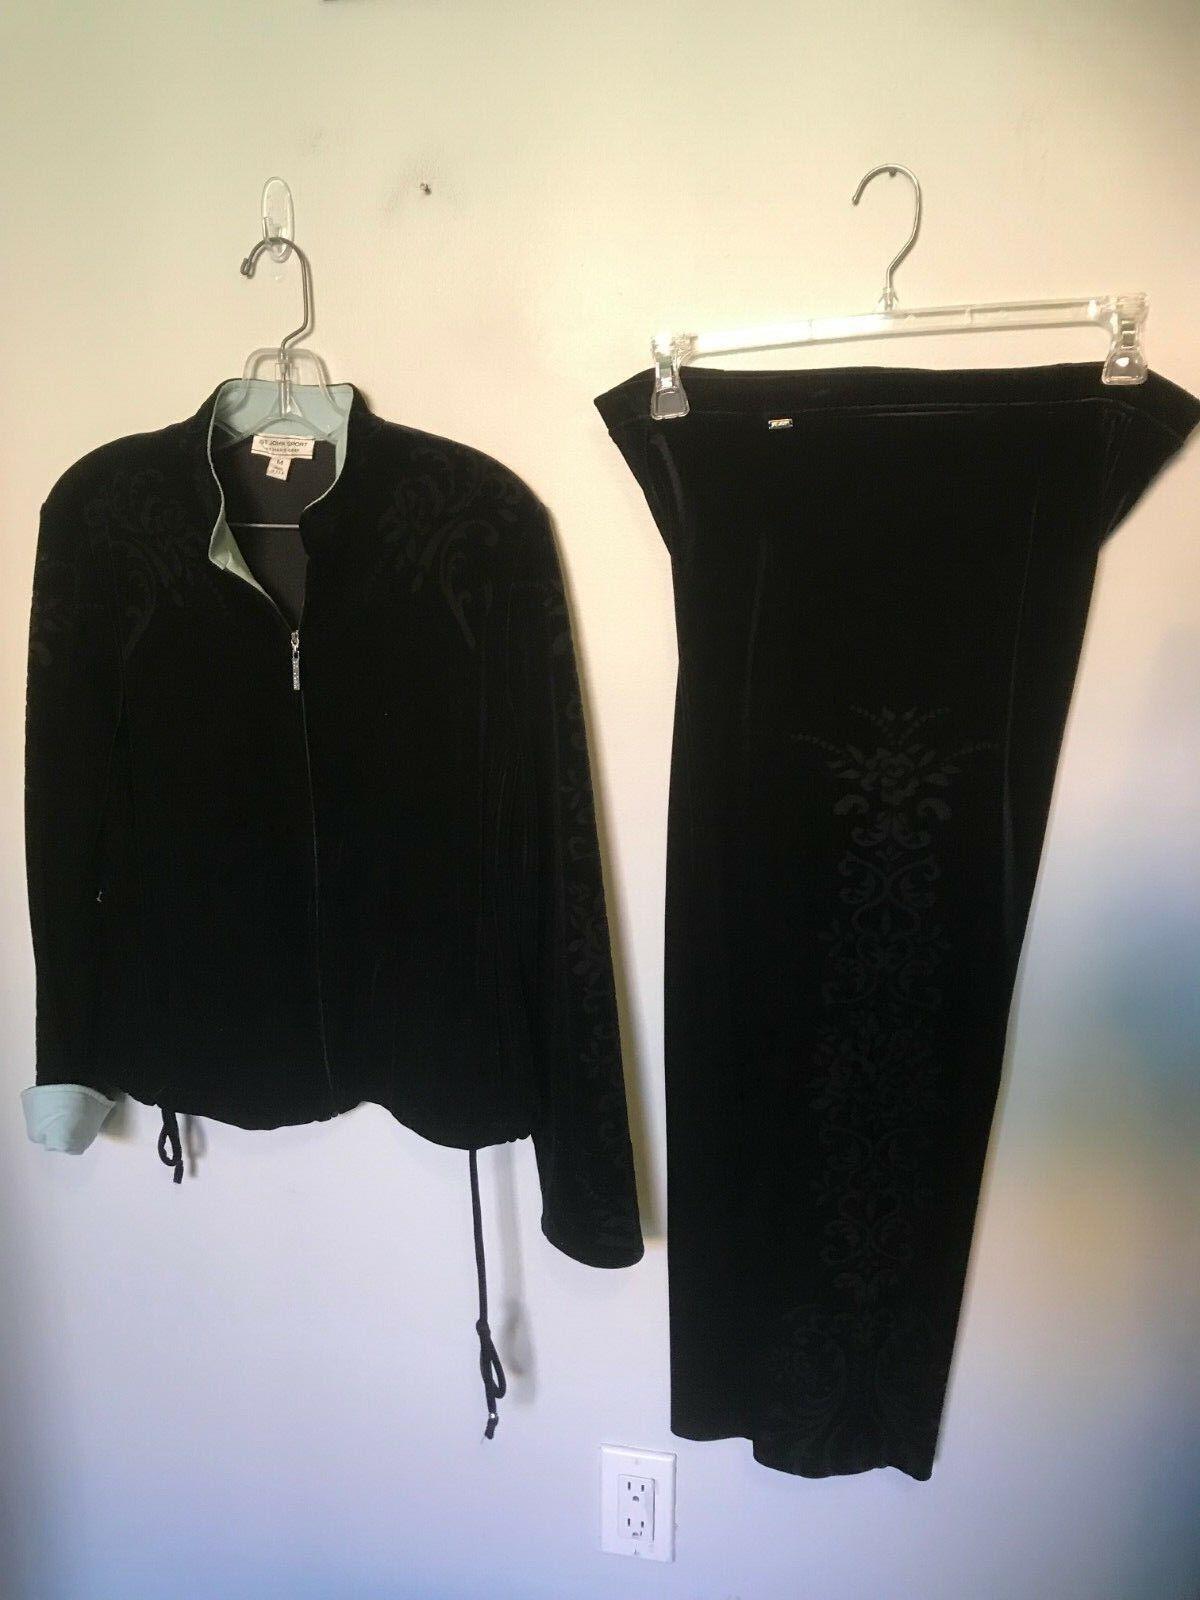 St John Terciopelo Negro queme Rastrear Suit-Talla S M   compras online de deportes